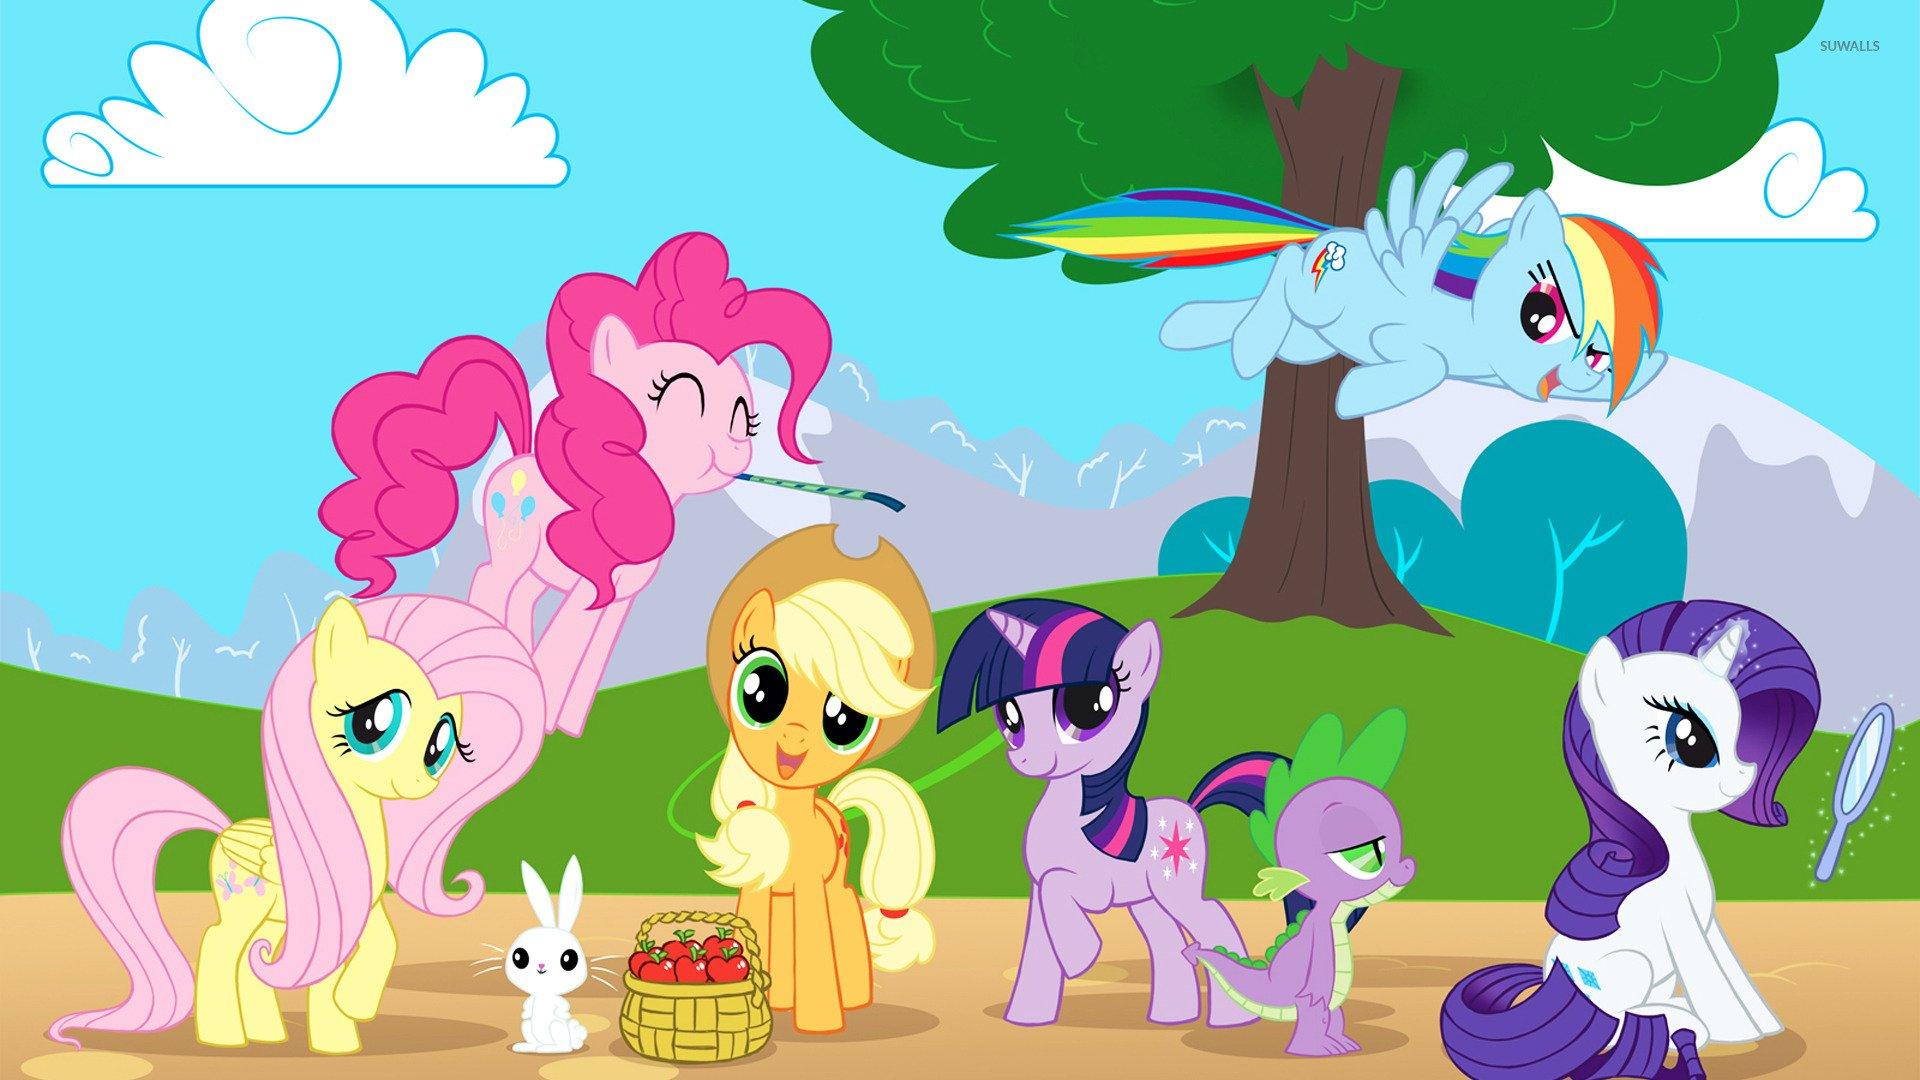 Free Download My Little Pony Friendship Is Magic Wallpaper Cartoon